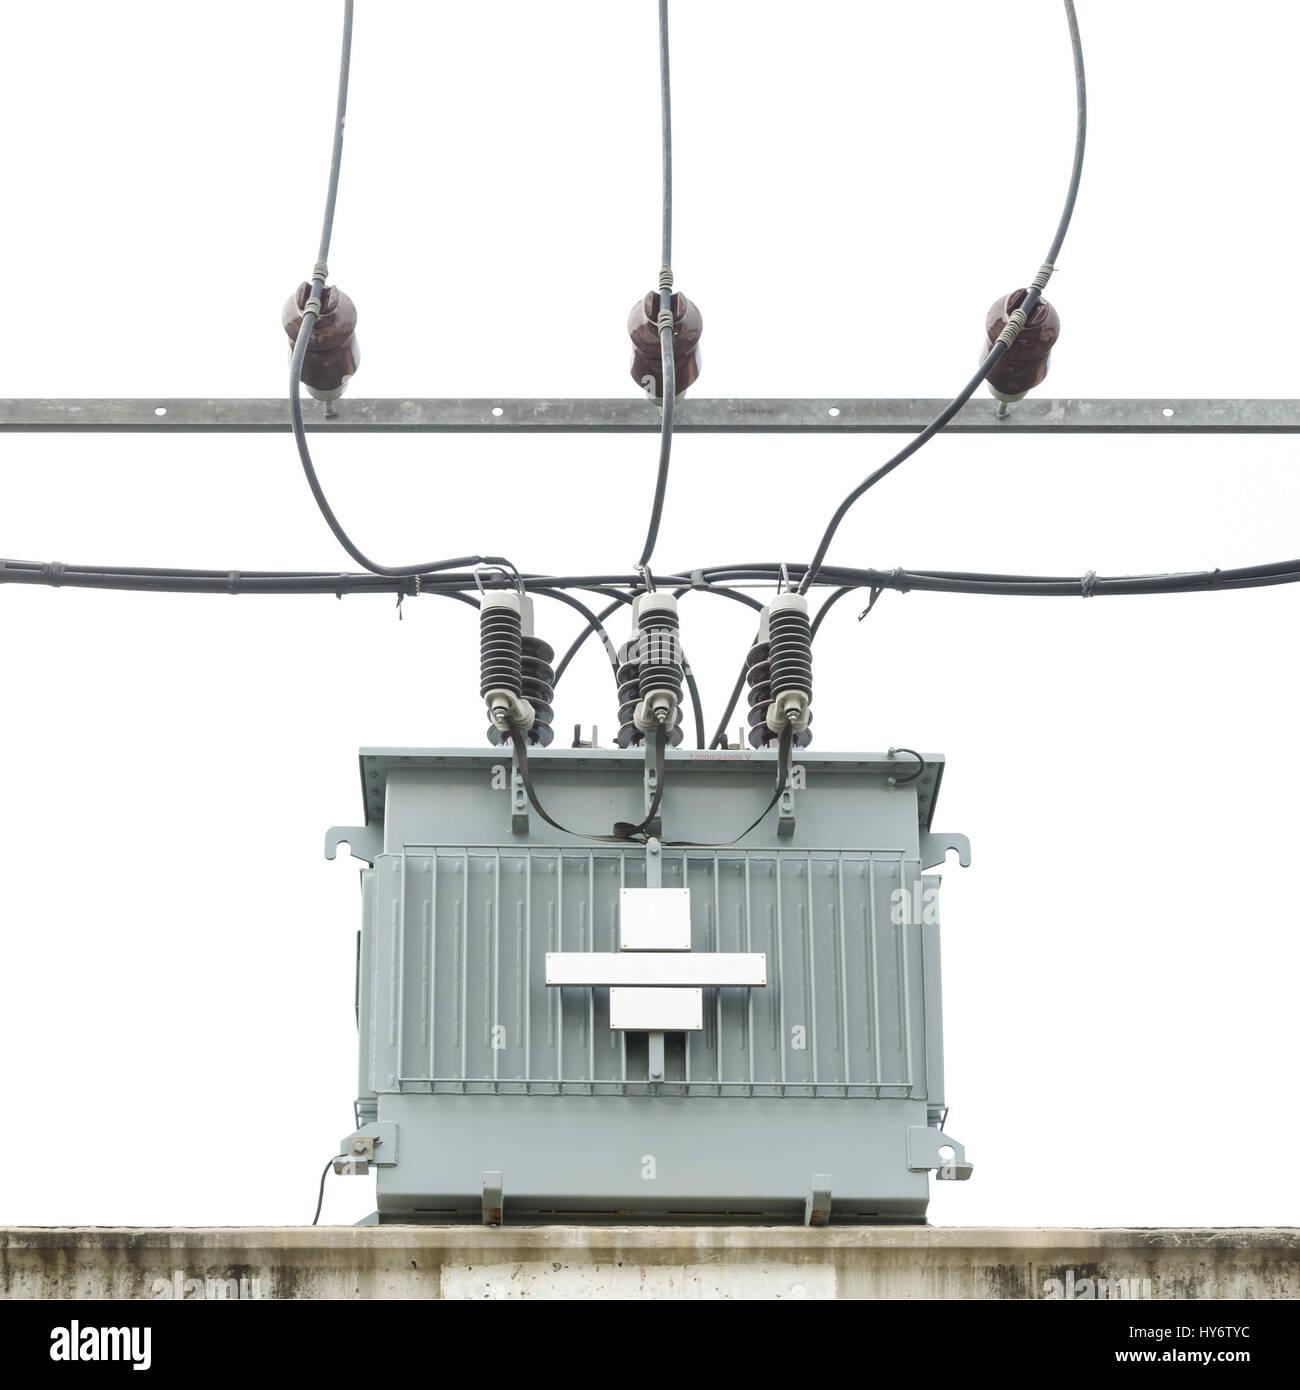 Husaberg Wiring Diagram Diagrams Schema Generic Auto Fe650e Sem Electrical Ktm